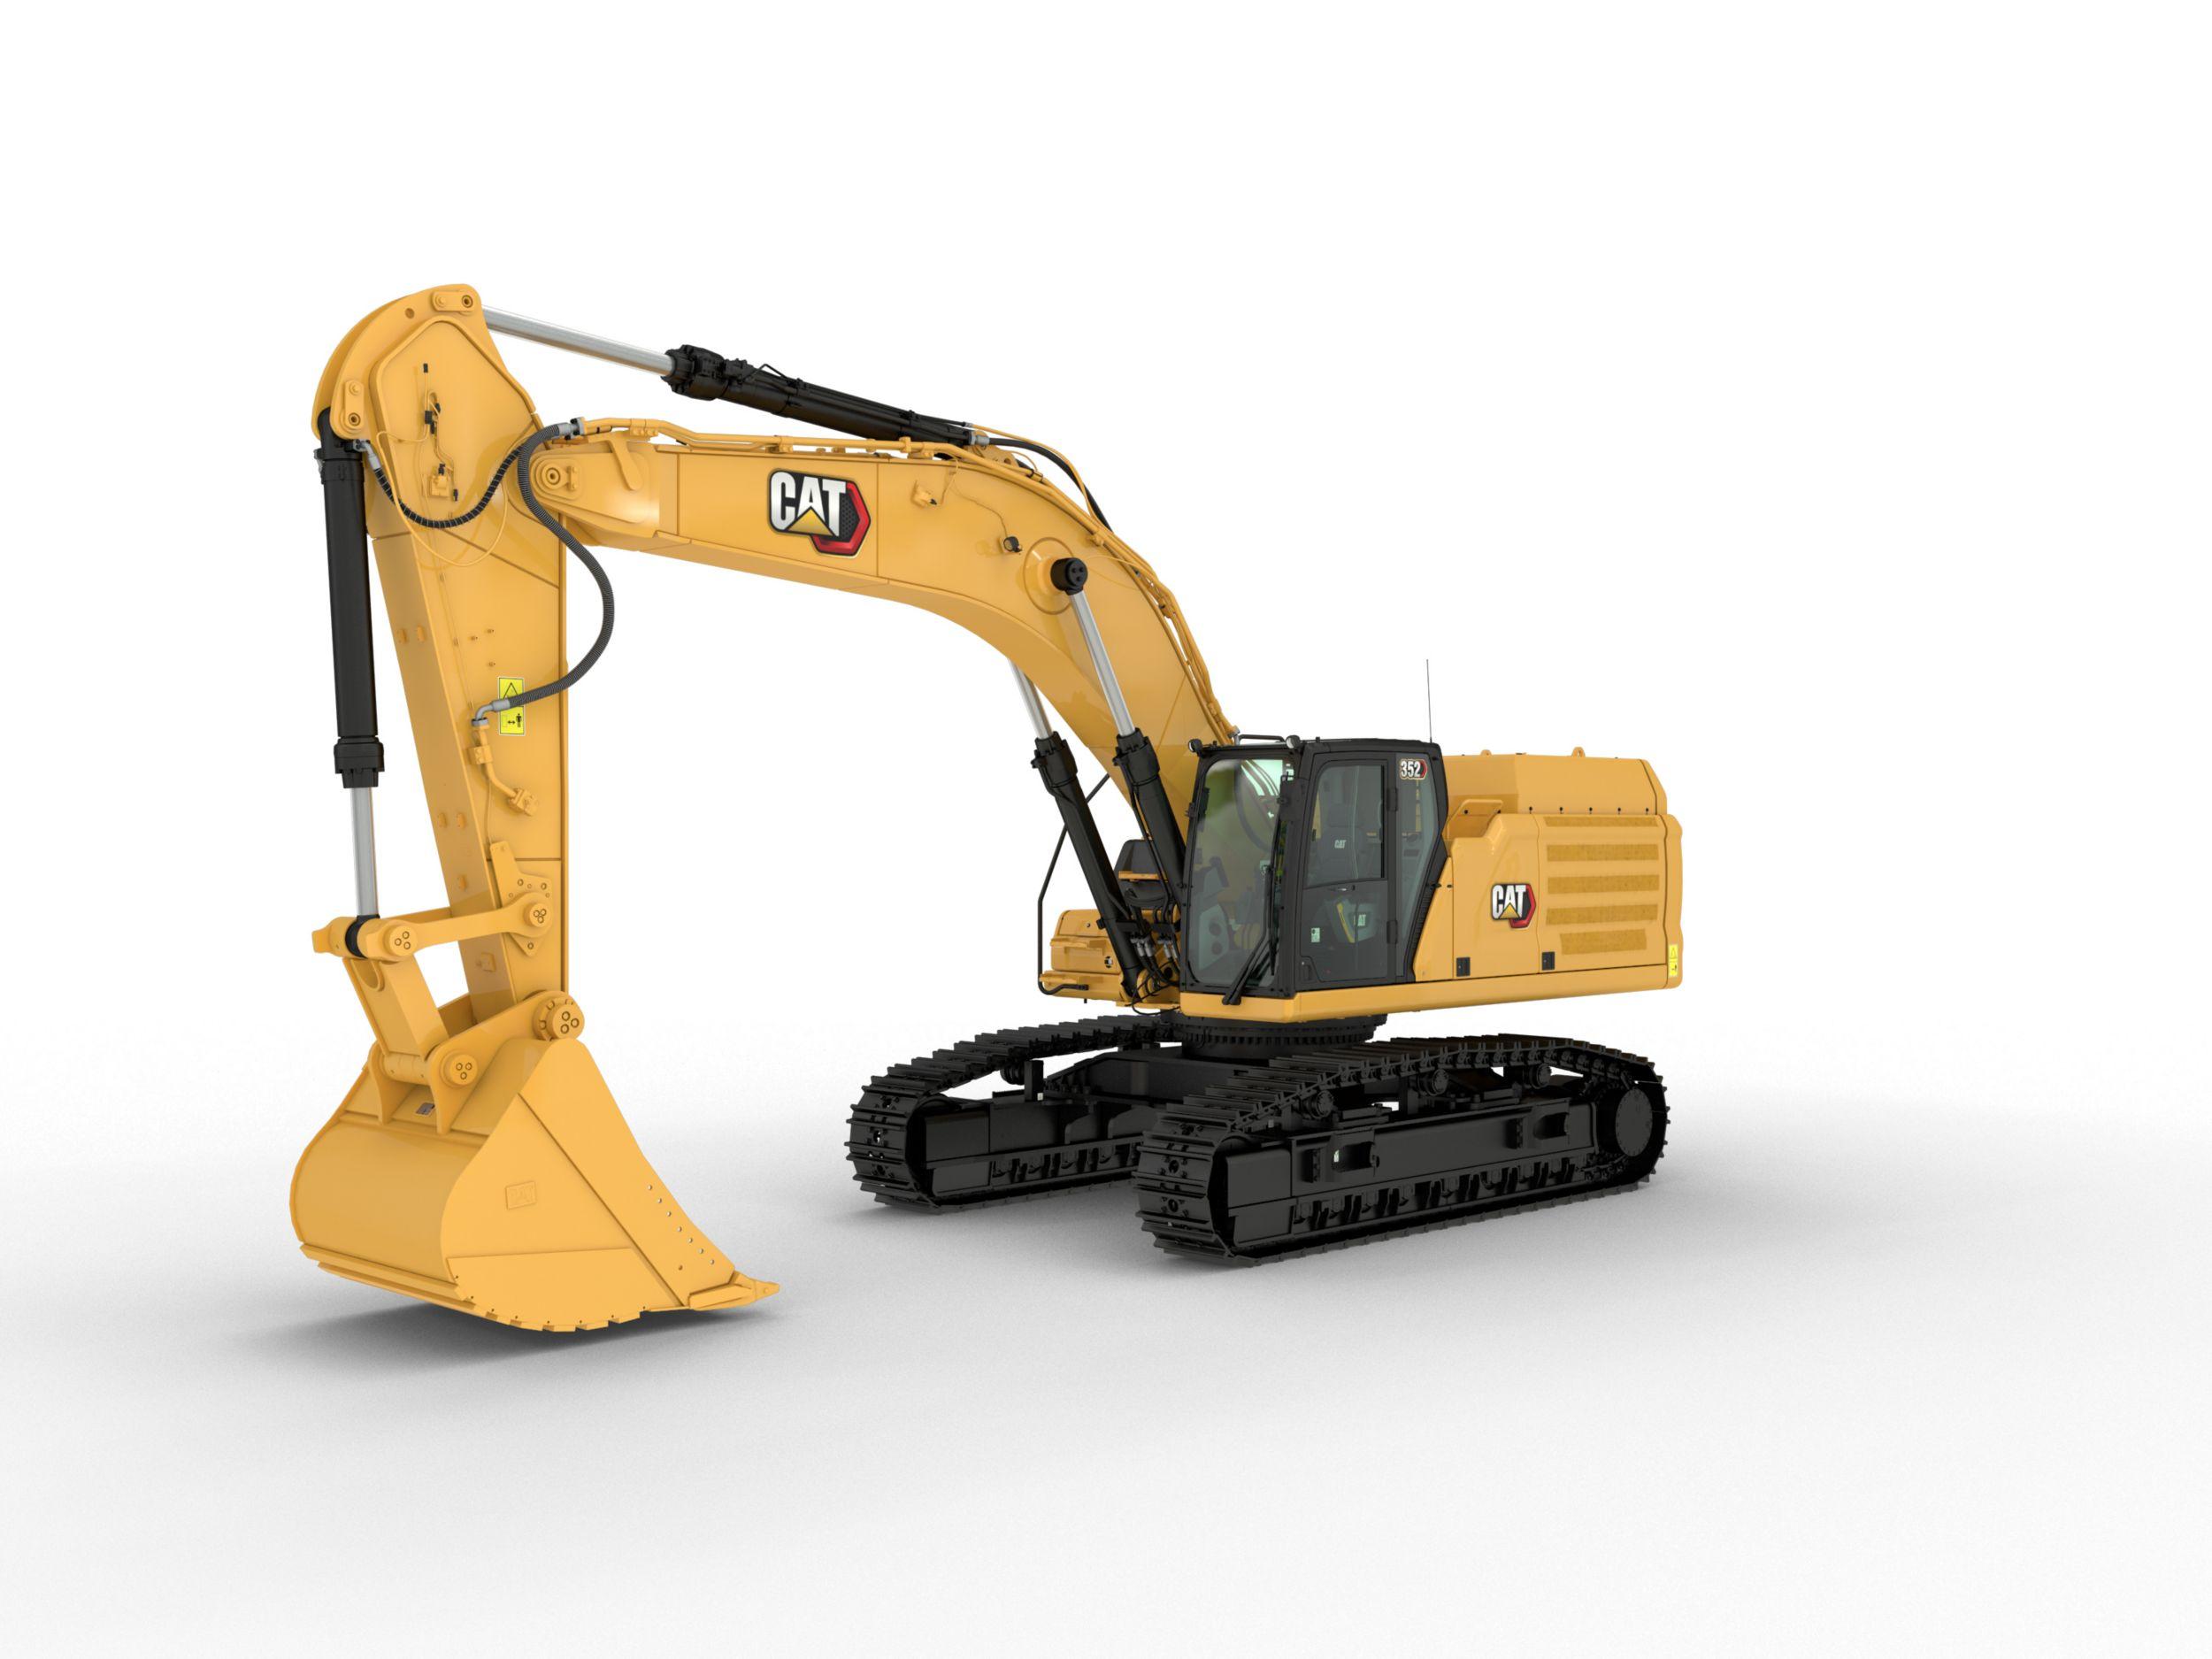 352 Hydraulic Excavator